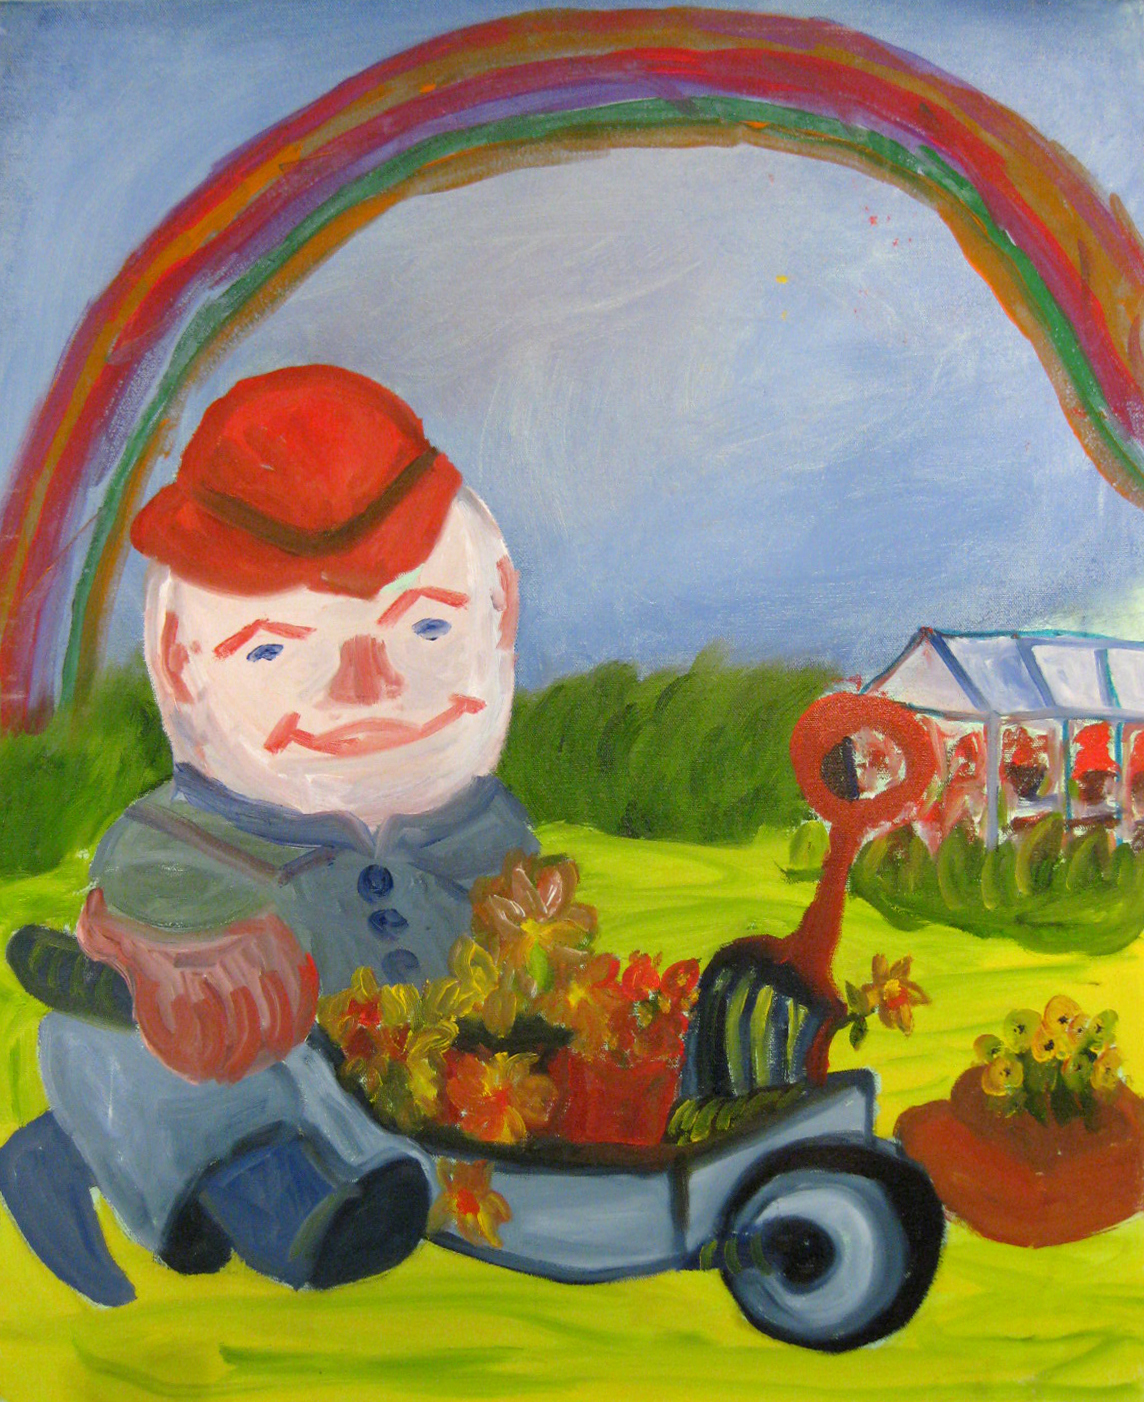 Pilgrim, George - Planting Time